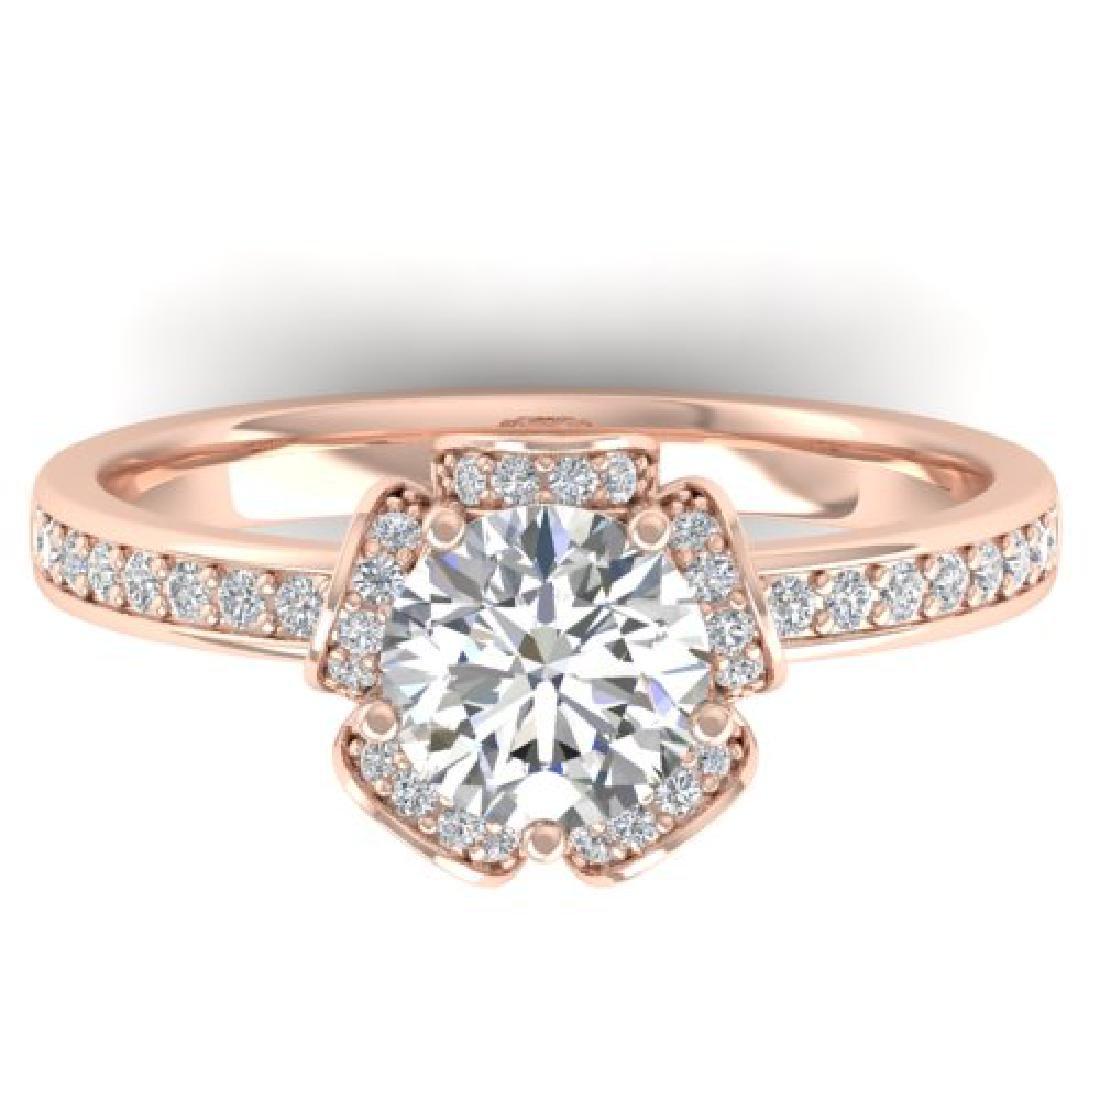 1.75 CTW Certified VS/SI Diamond Art Deco Ring 18K Rose